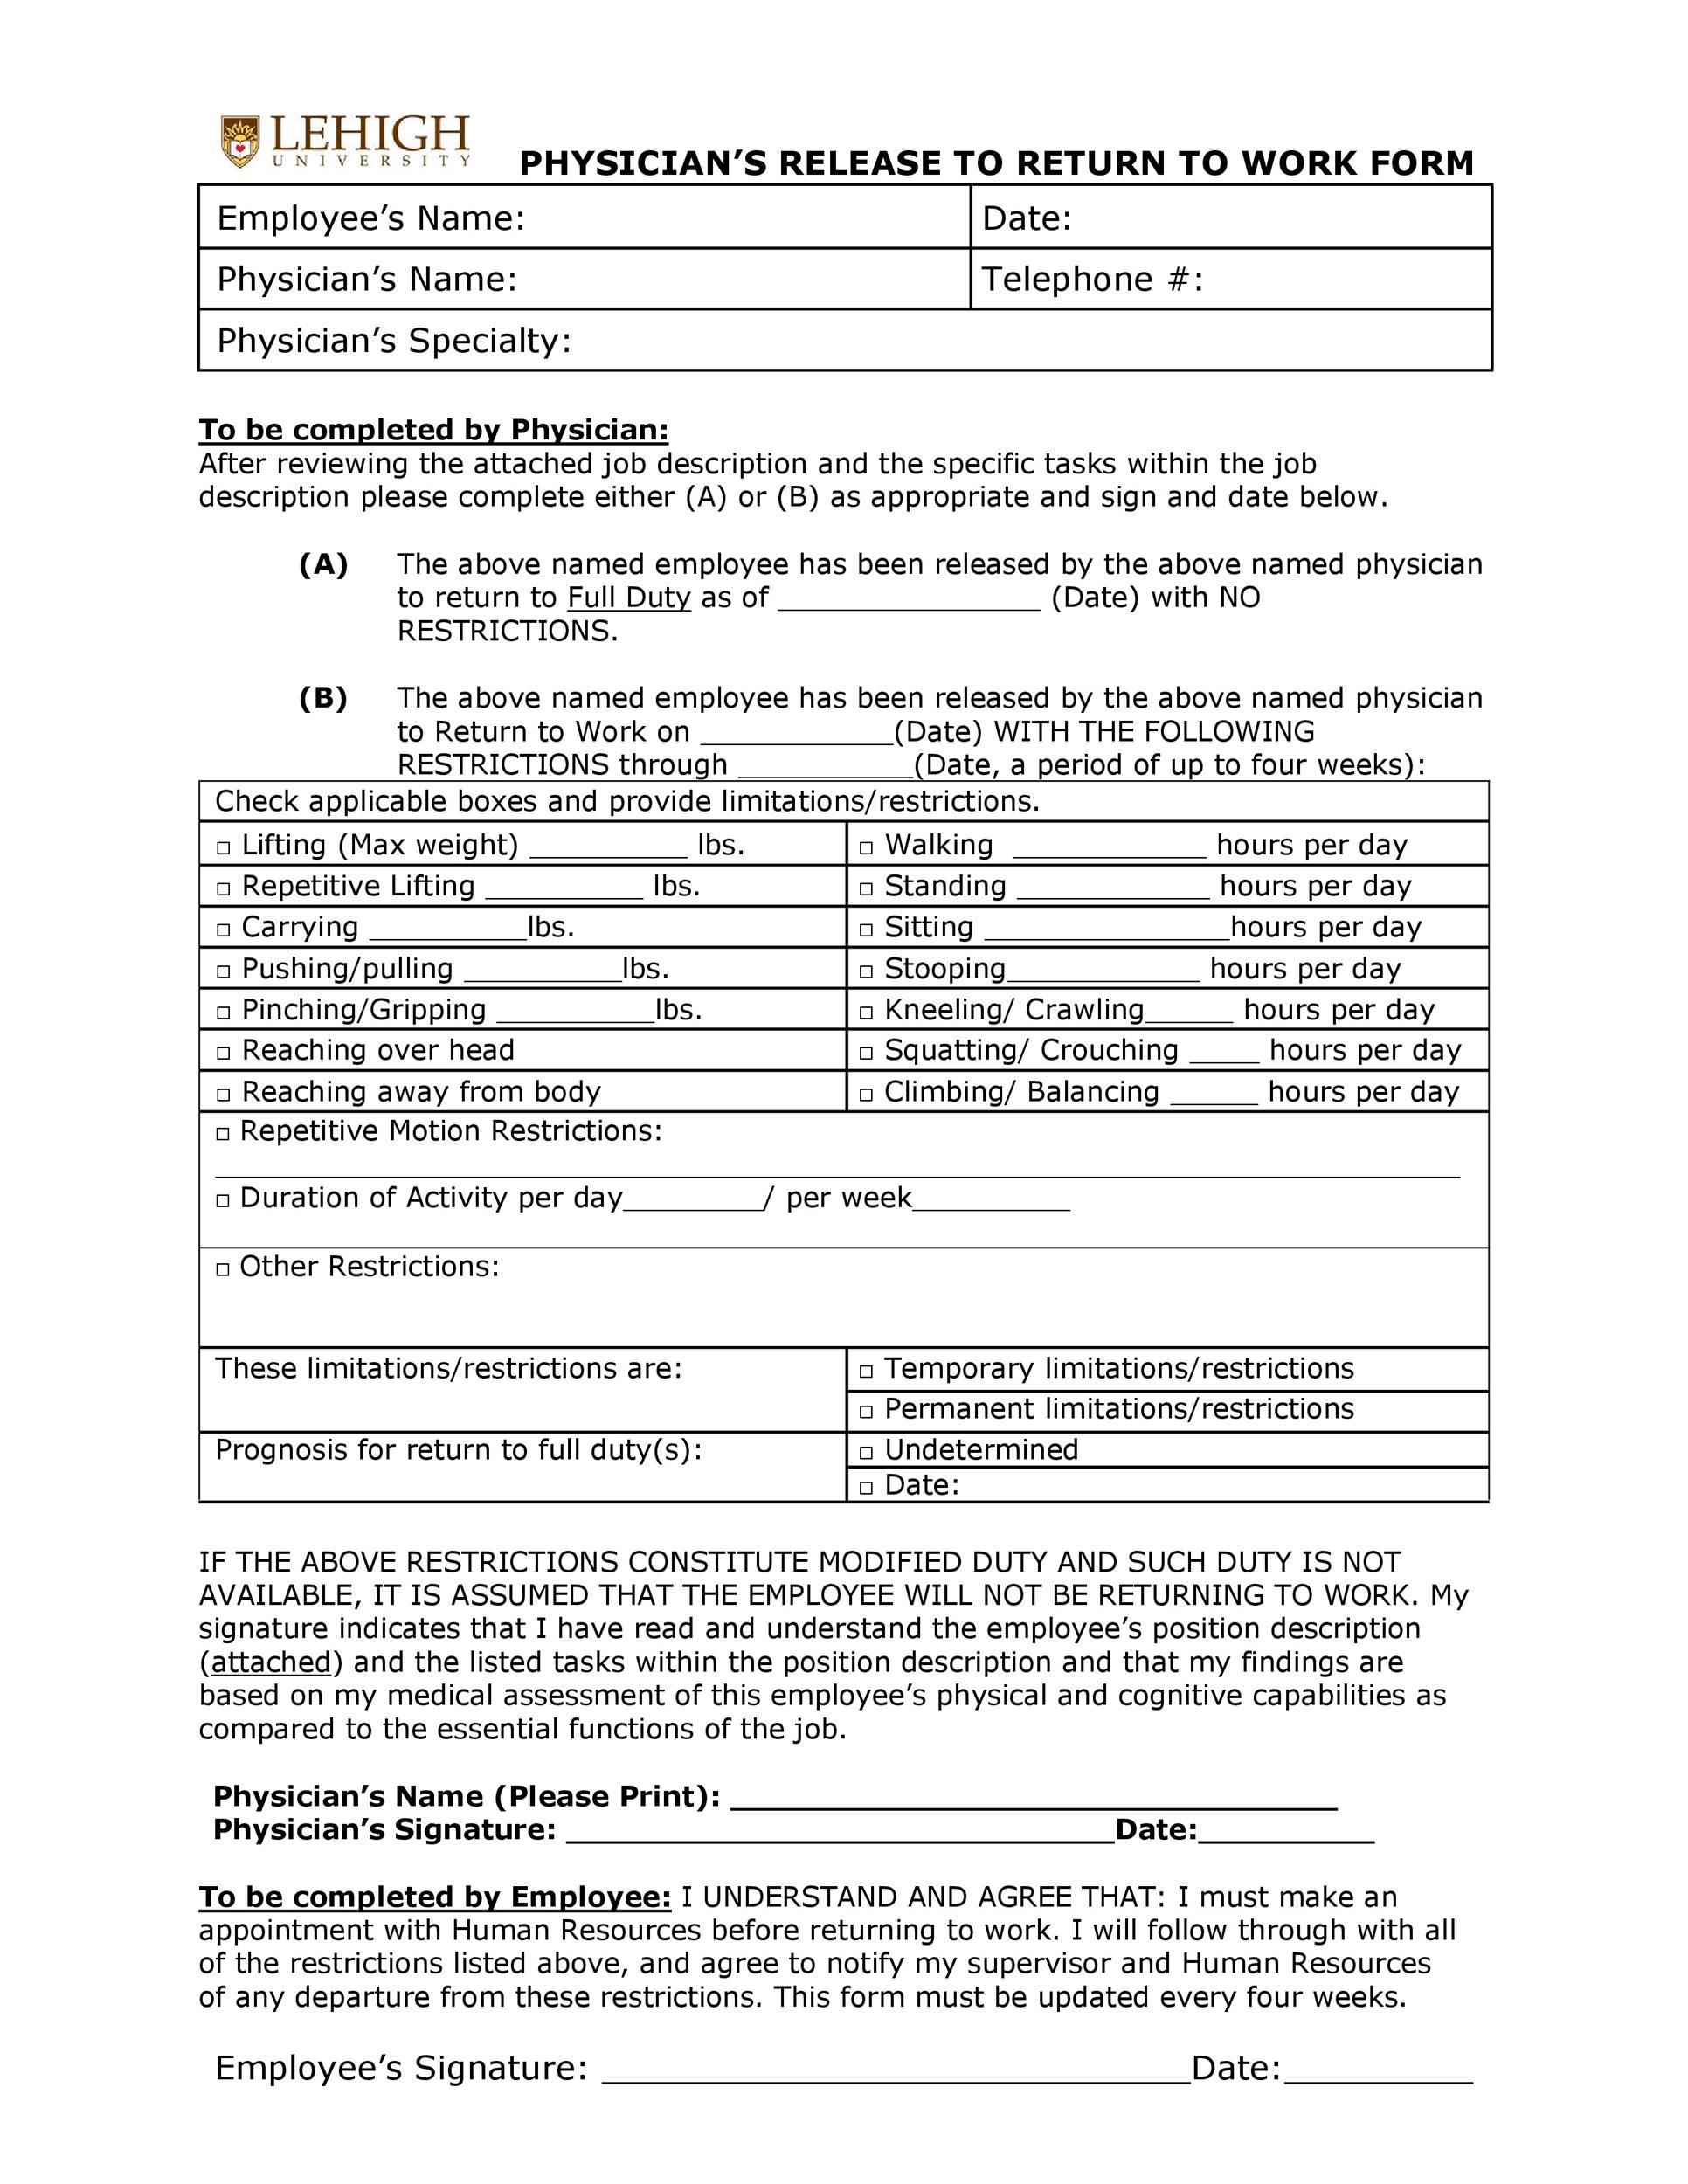 Free return to work form 30